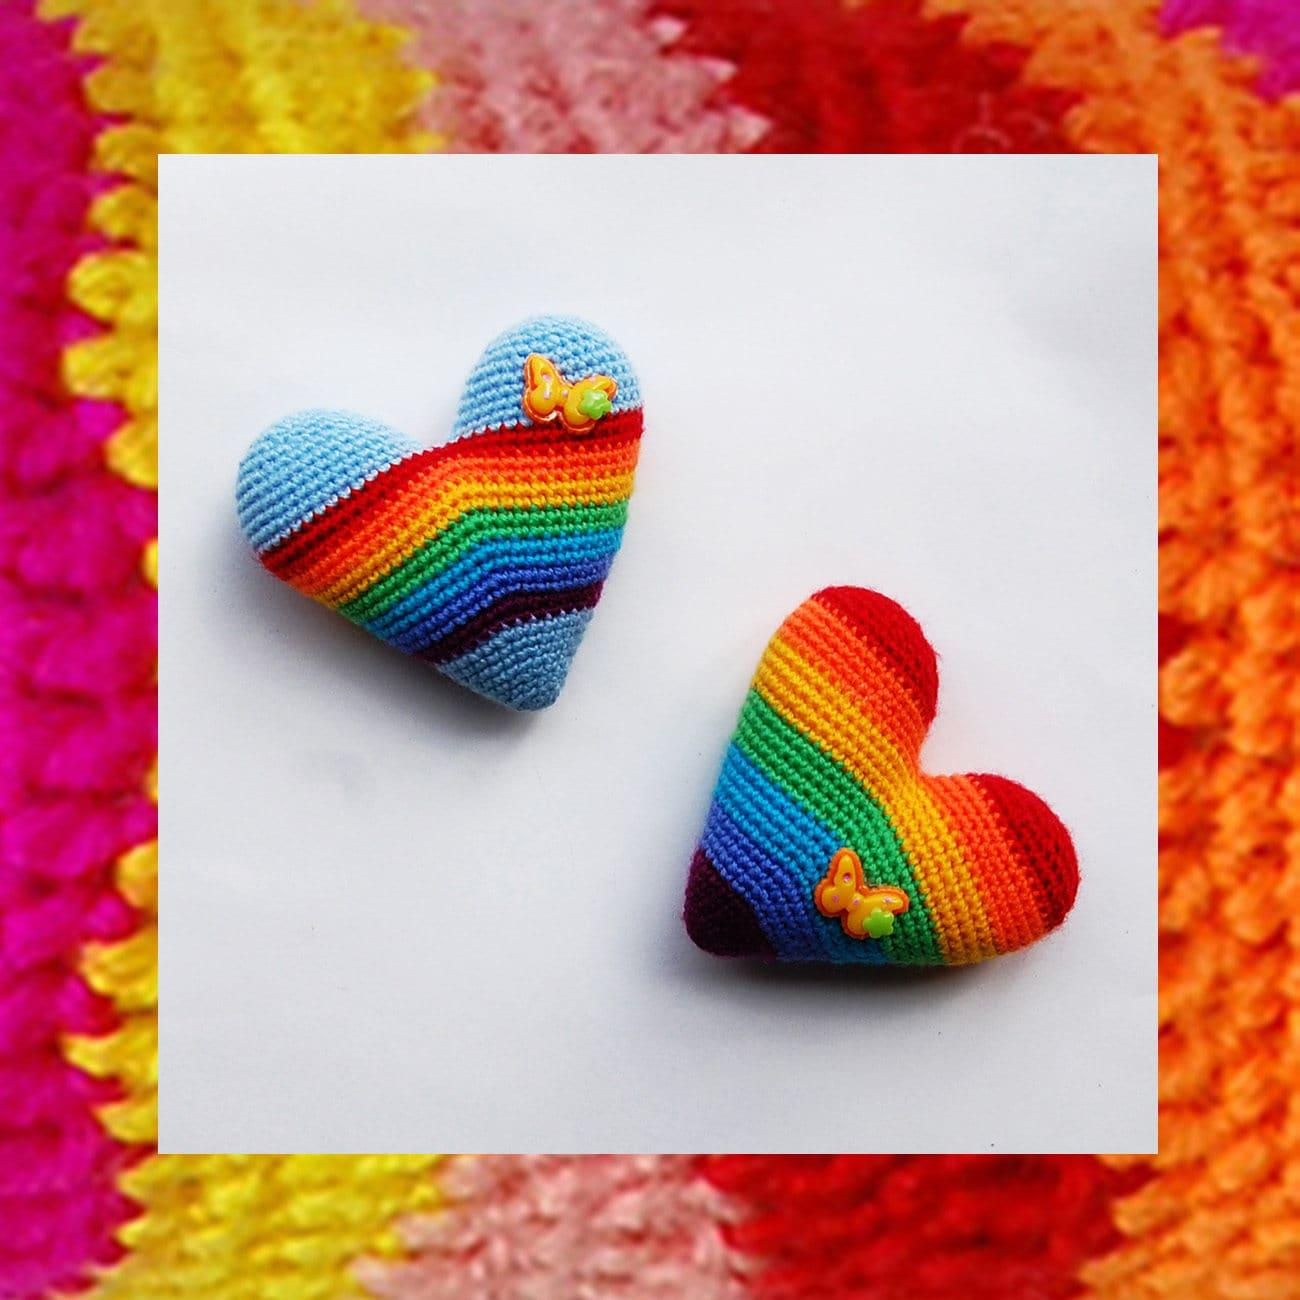 072 Crochet Heart Pattern Rainbow Heart Amigurumi Pattern Etsy